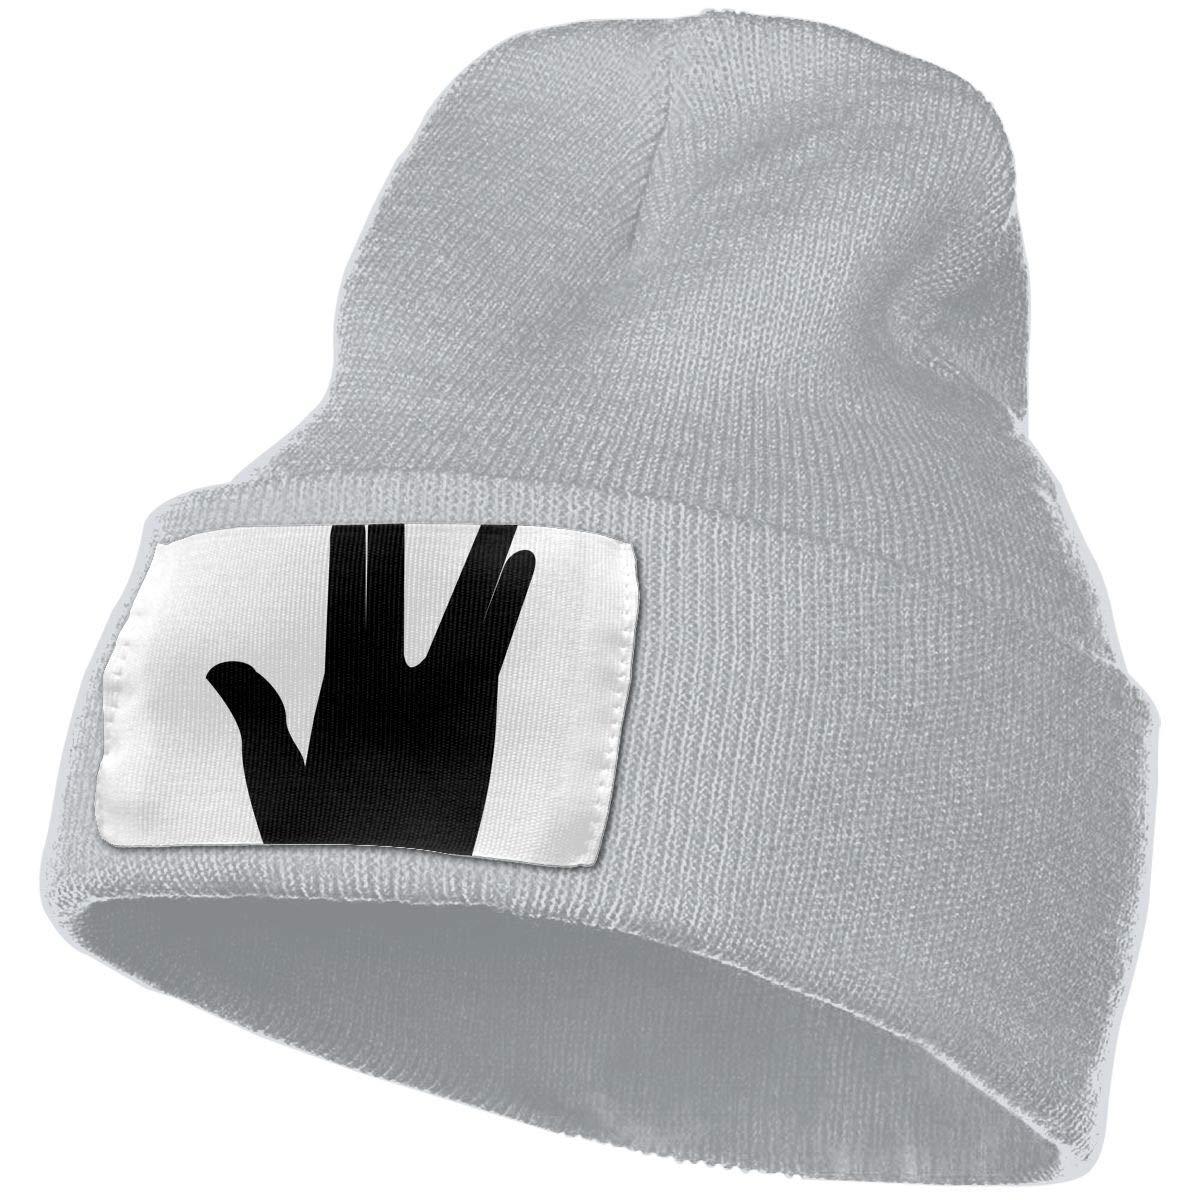 QZqDQ Live Long Unisex Fashion Knitted Hat Luxury Hip-Hop Cap